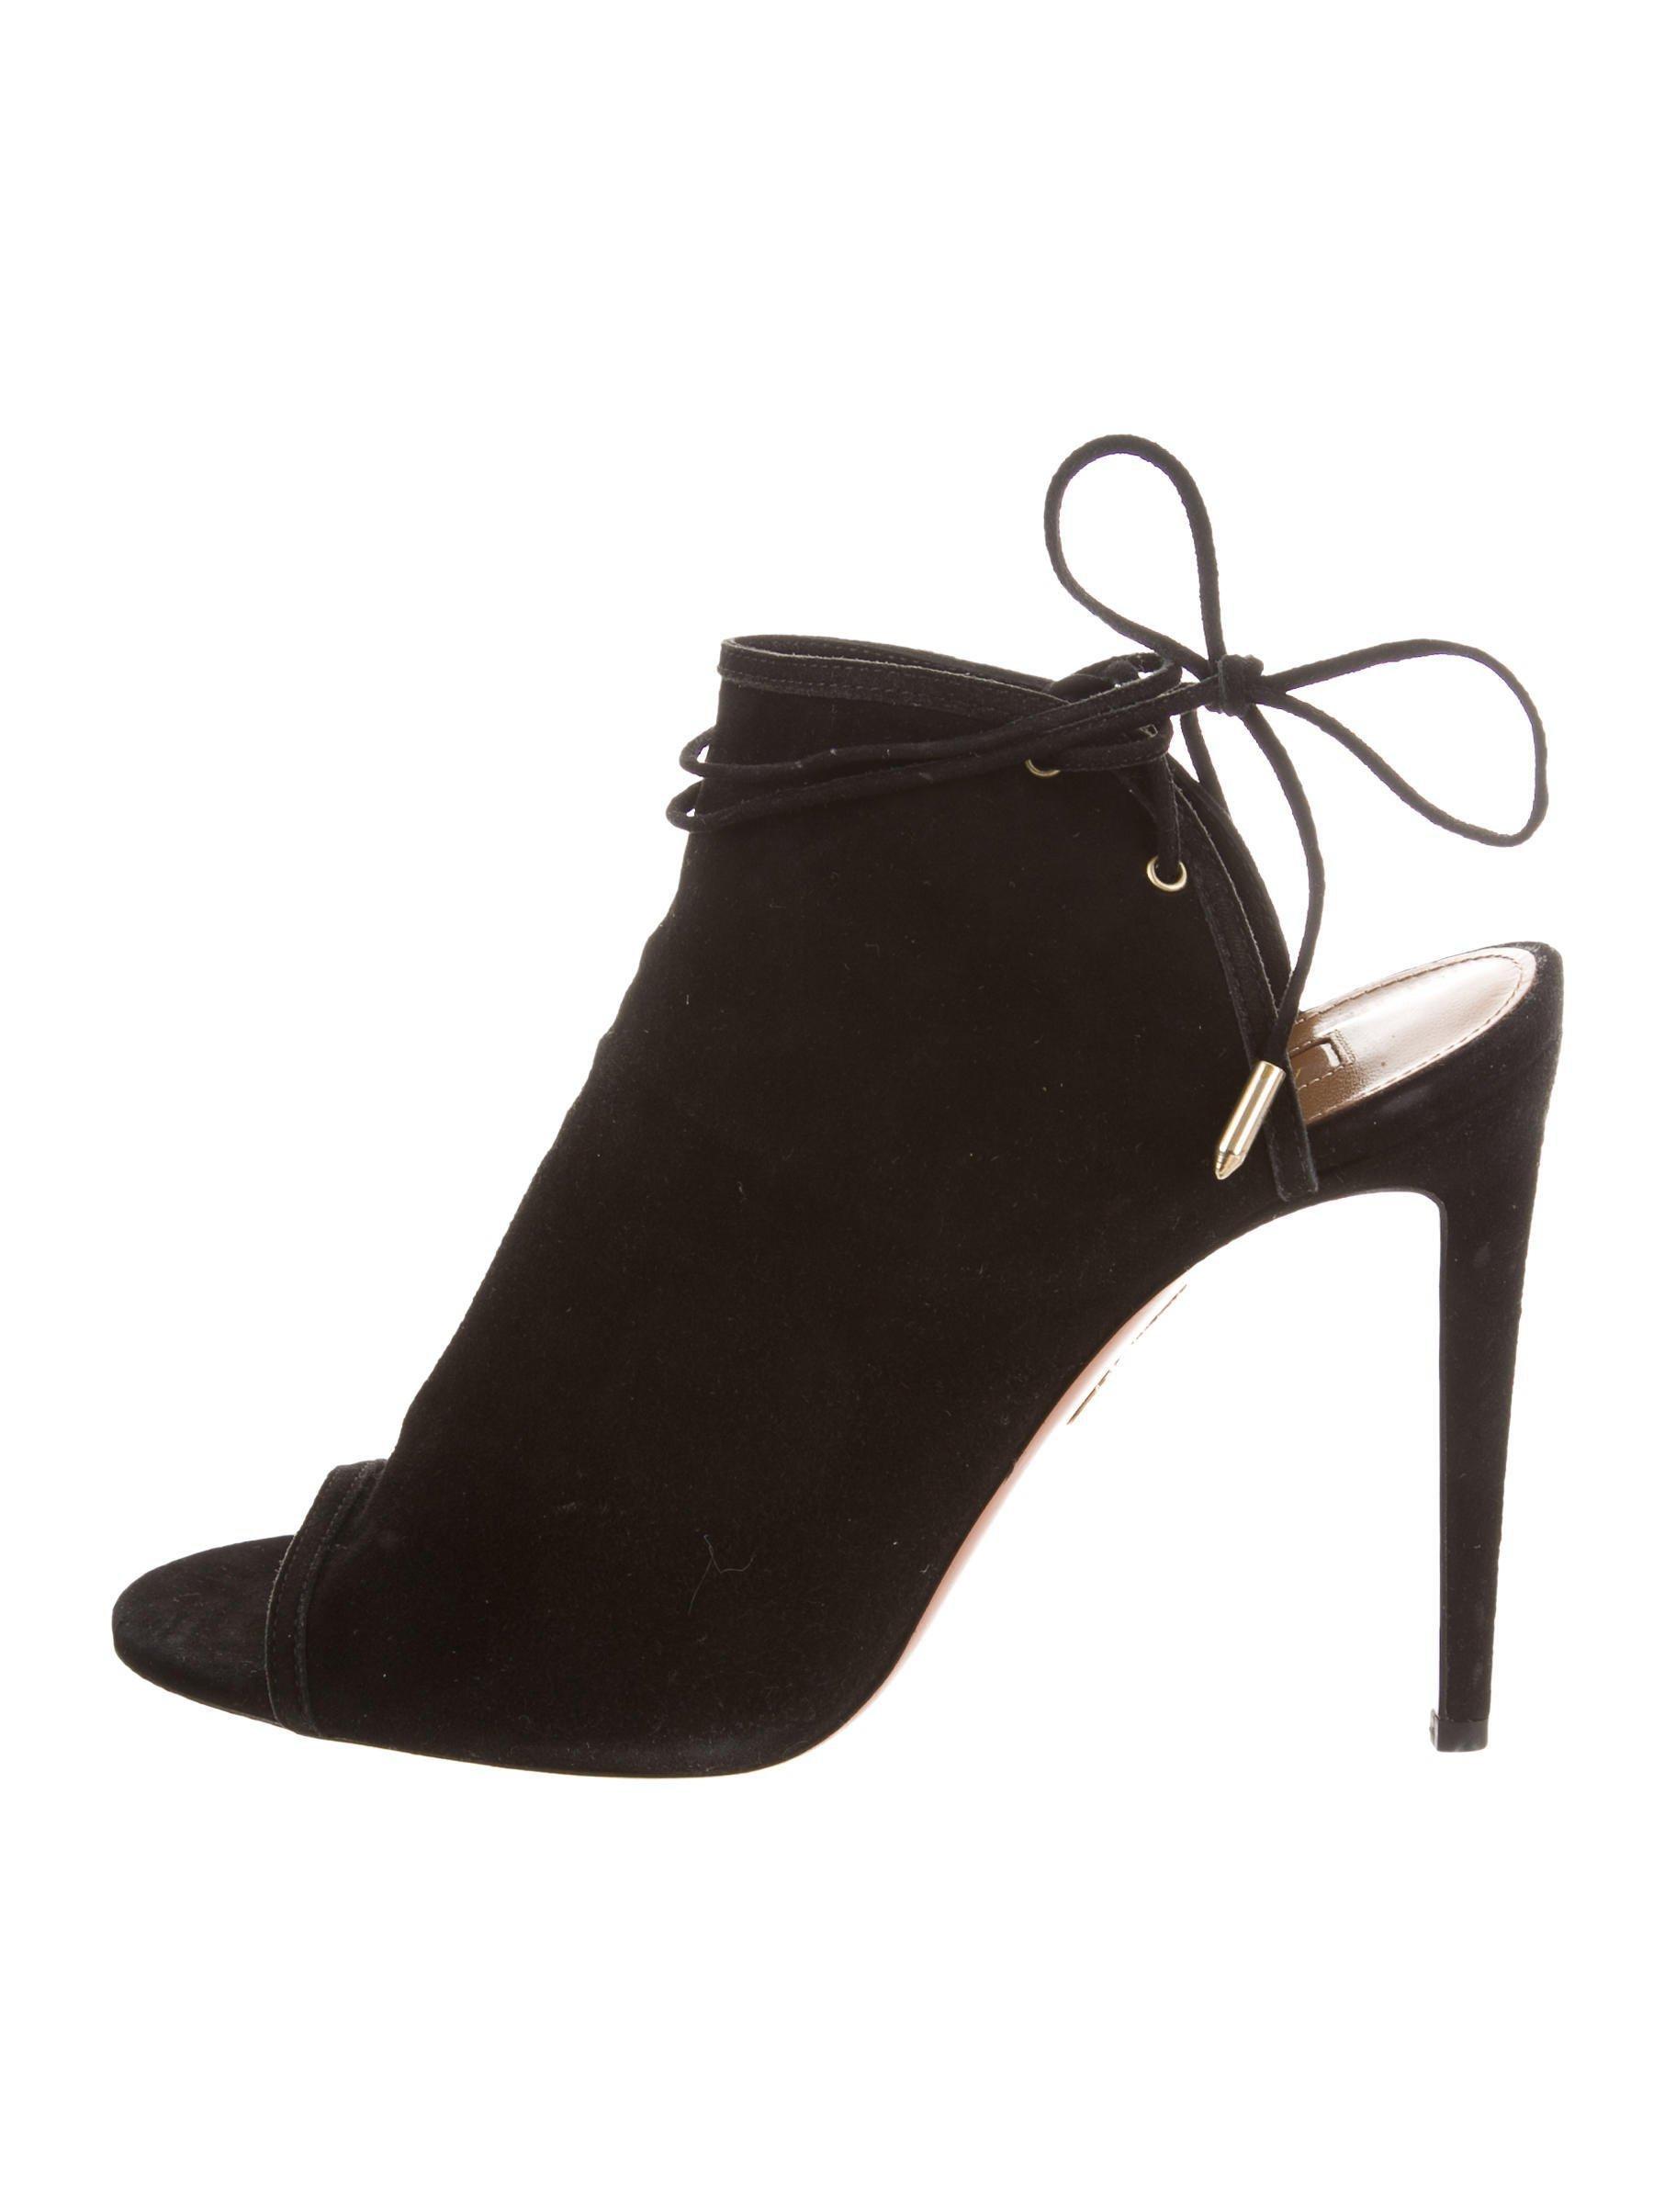 shop offer cheap online best wholesale for sale Aquazzura Mayfair 105 Sandals 2015 new online 2014 new WcZM7B